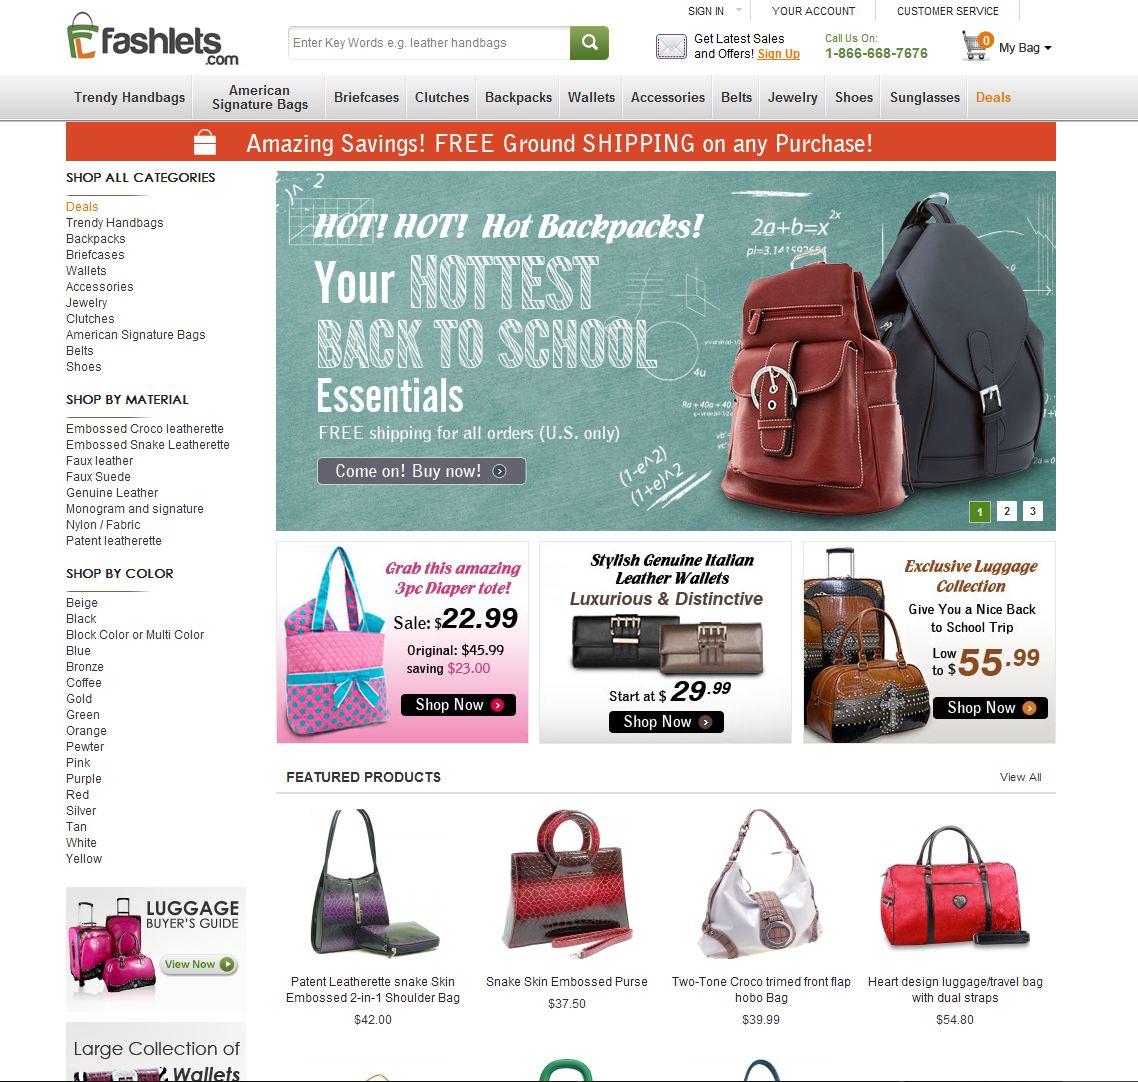 Fashlets.com